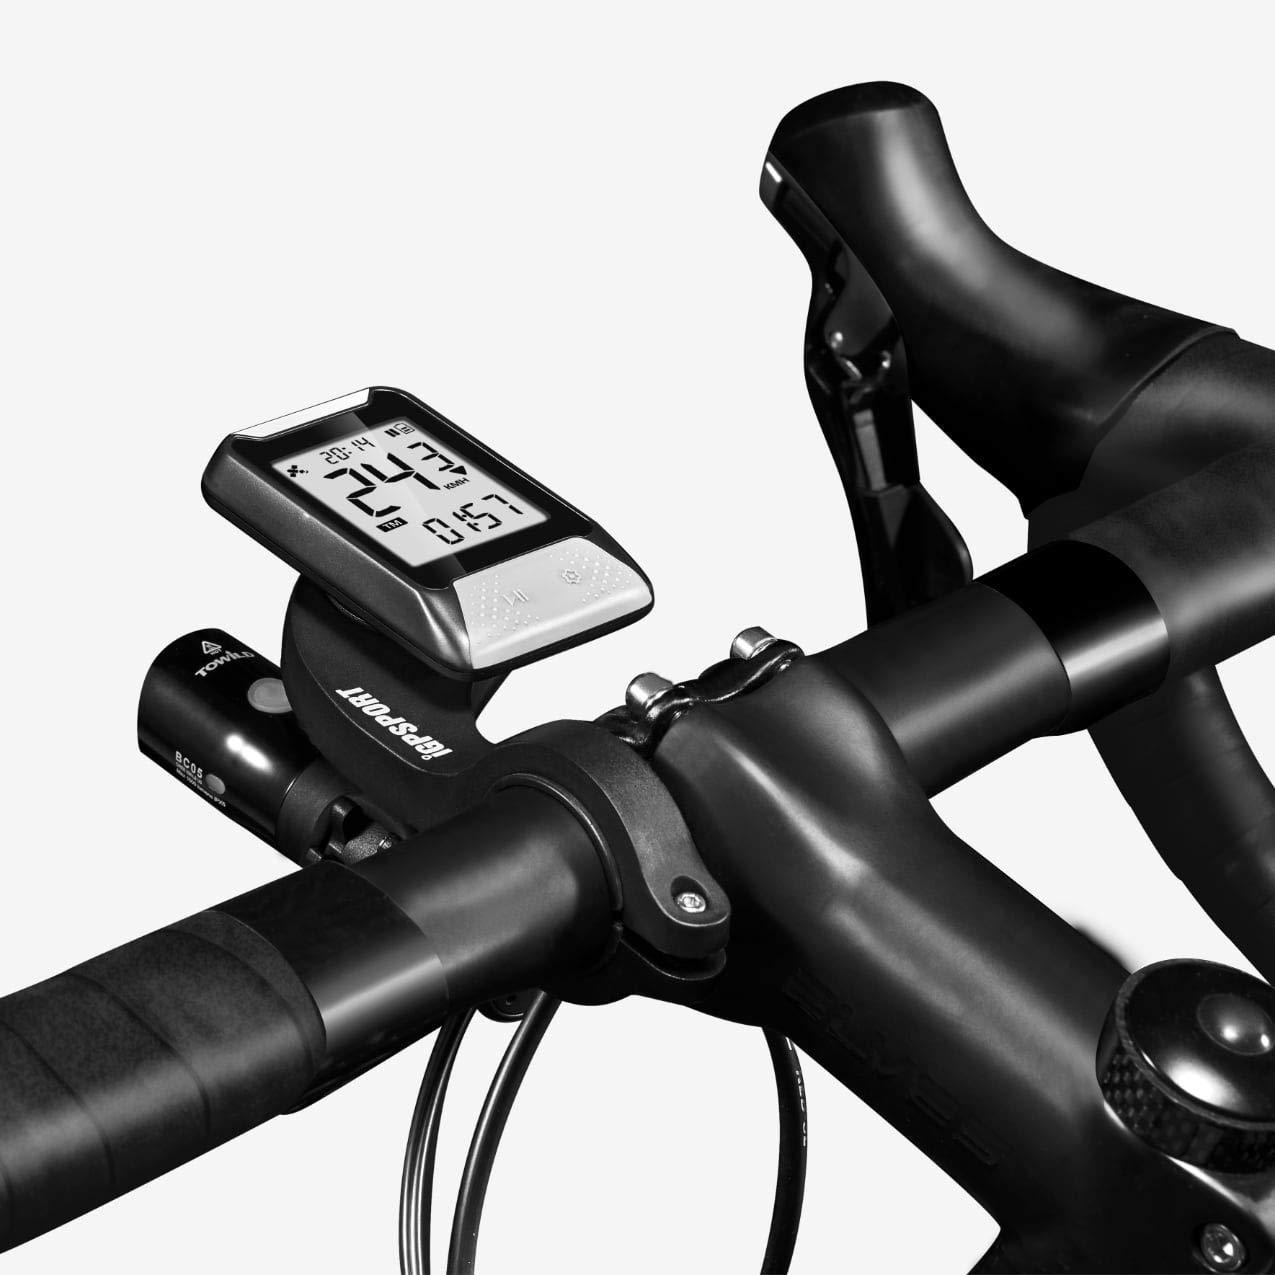 Compteur de V/élo GPS Simplifi/é Vitesse odom/ètre IPX7 r/étro/éclair/é Cardio Nouveau iGS20E iGS130